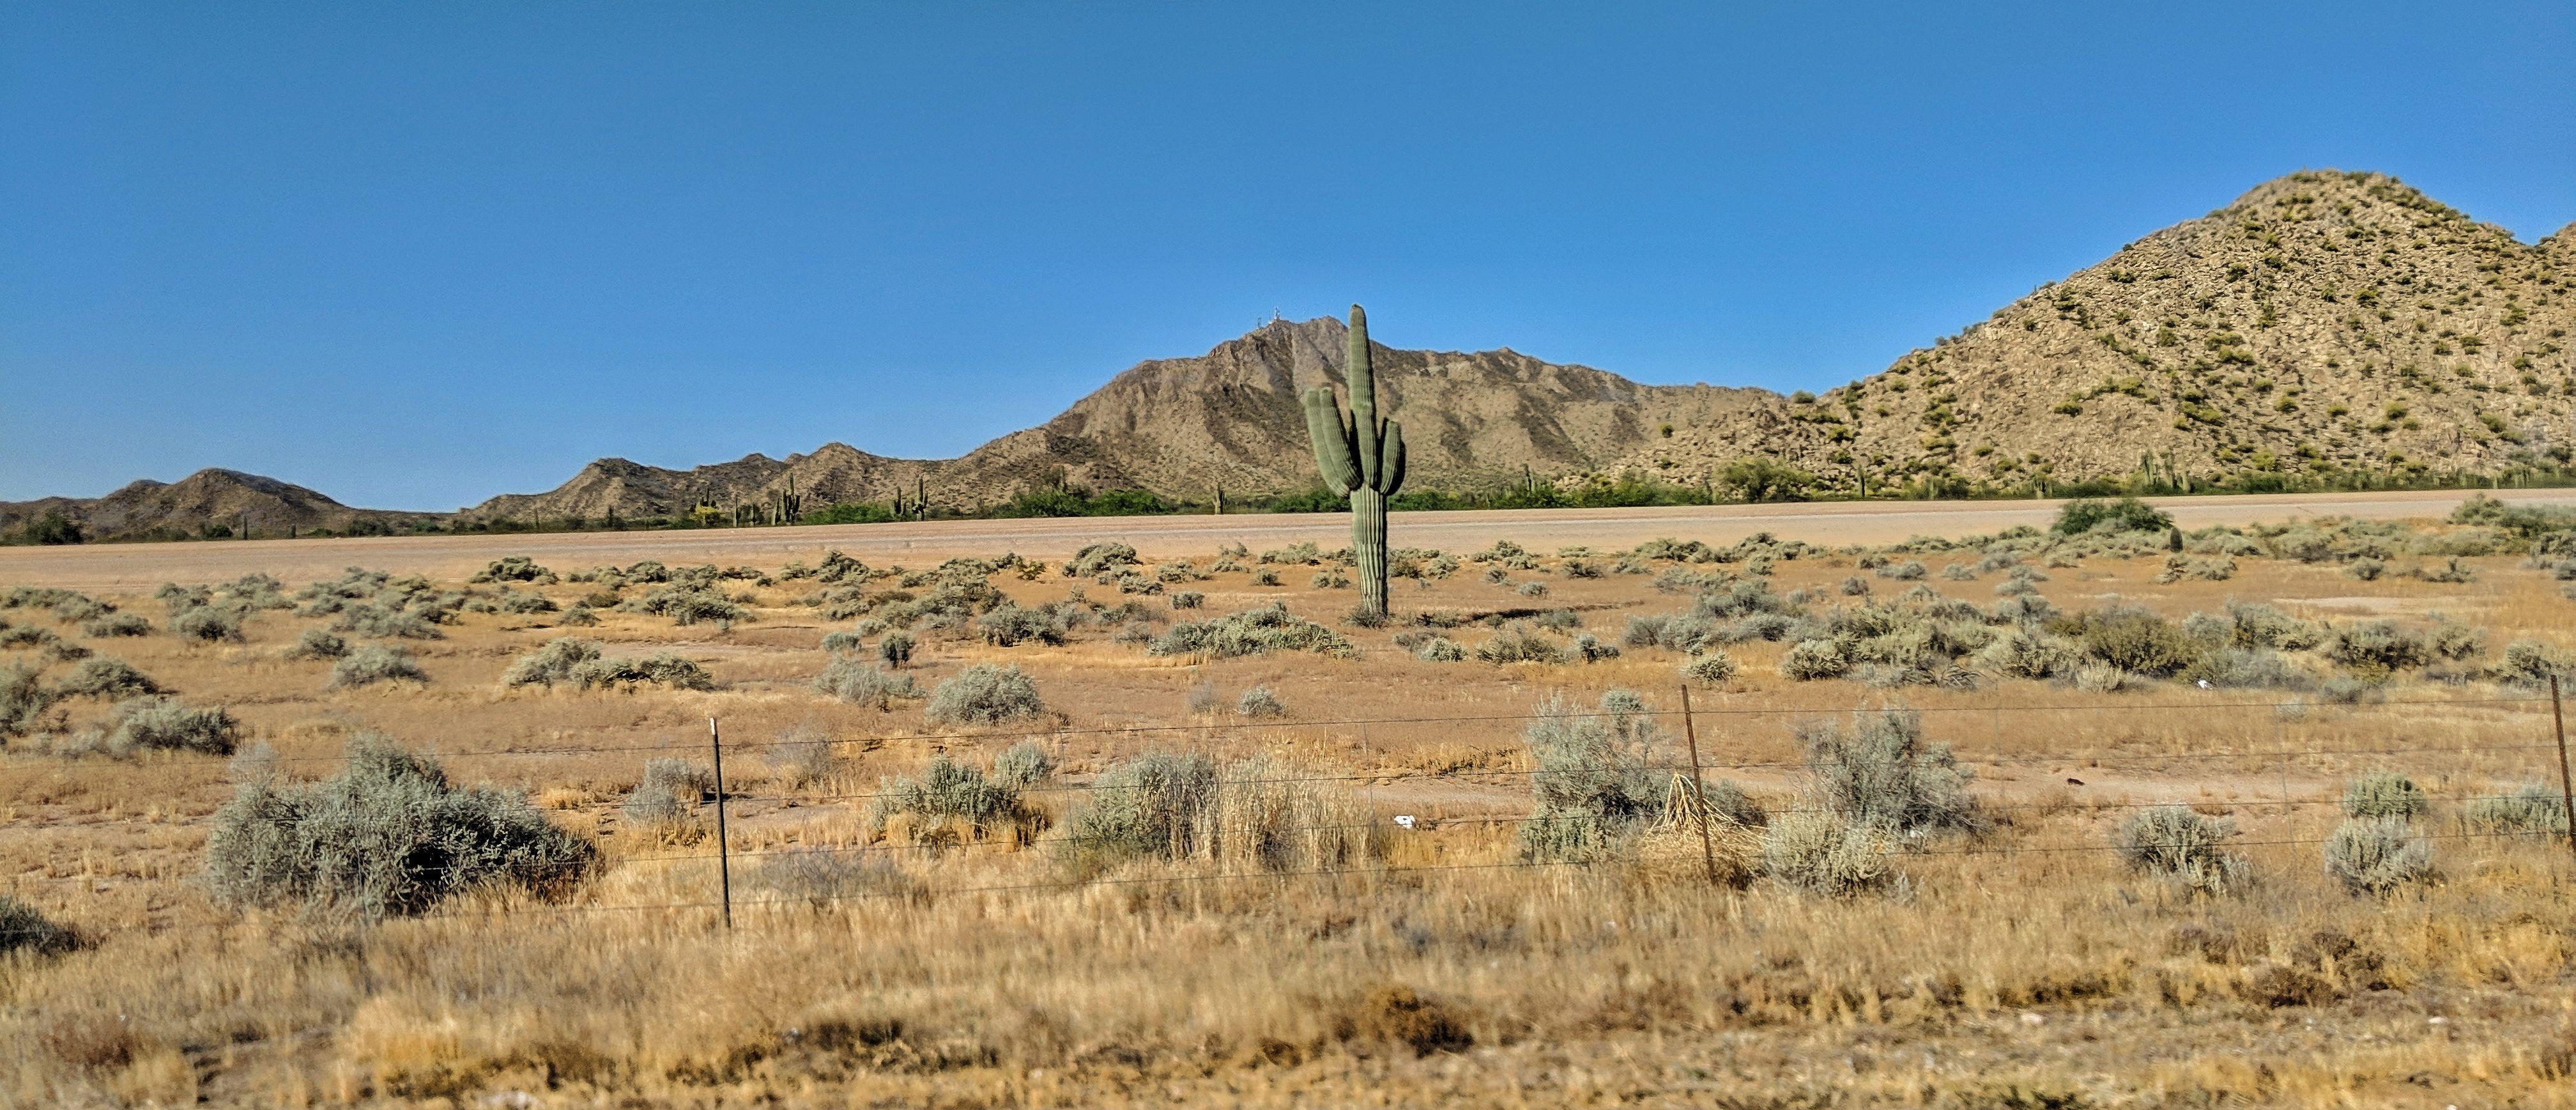 Coolidge Arizona Cactus #arizonacactus Coolidge Arizona Cactus #arizonacactus Coolidge Arizona Cactus #arizonacactus Coolidge Arizona Cactus #arizonacactus Coolidge Arizona Cactus #arizonacactus Coolidge Arizona Cactus #arizonacactus Coolidge Arizona Cactus #arizonacactus Coolidge Arizona Cactus #arizonacactus